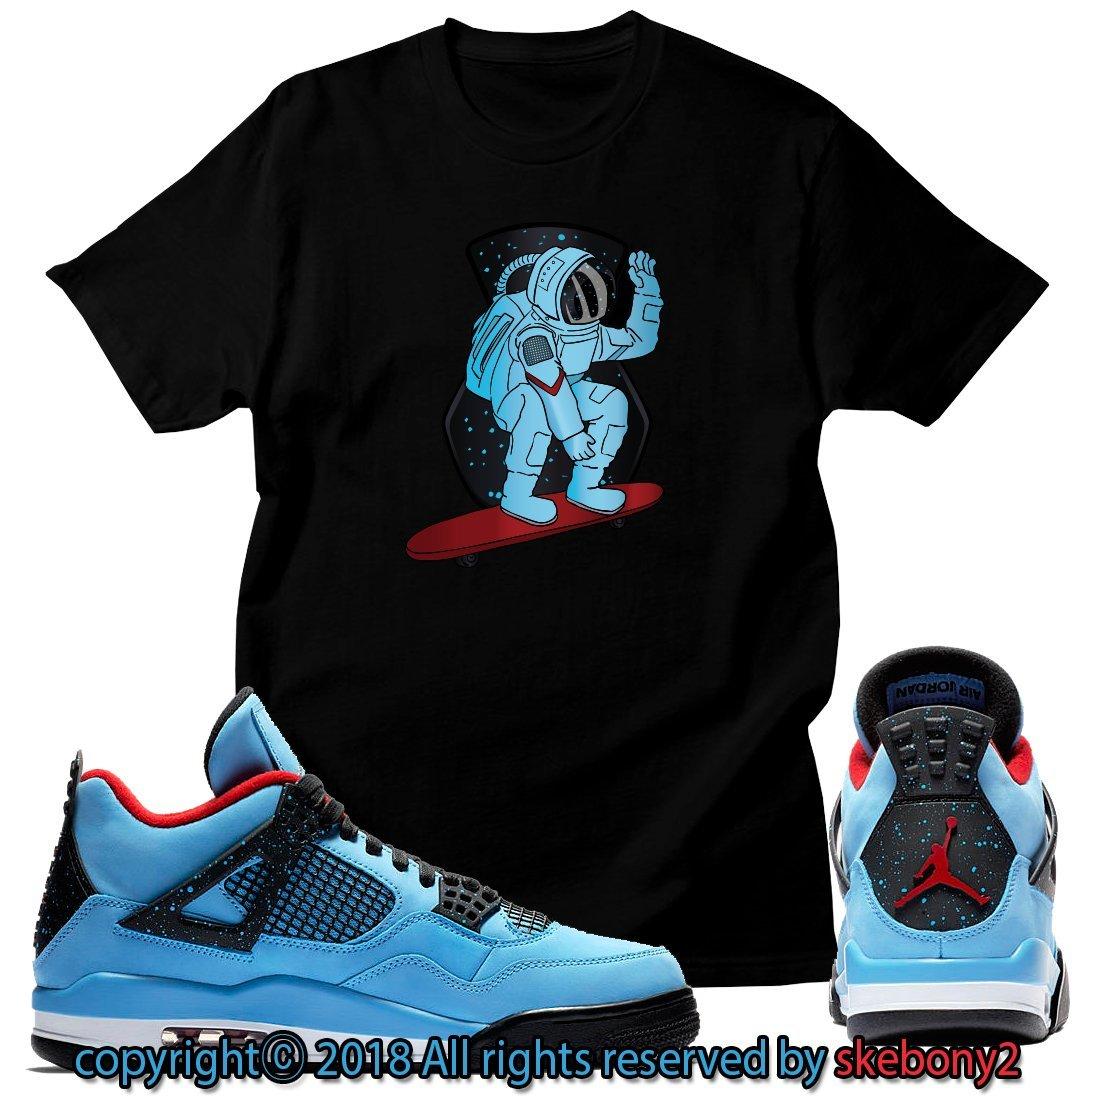 e1f6ab3c1 Custom T Shirt Matching Travis Scott x Air Jordan 4 Cactus Jack JD 4-1-3